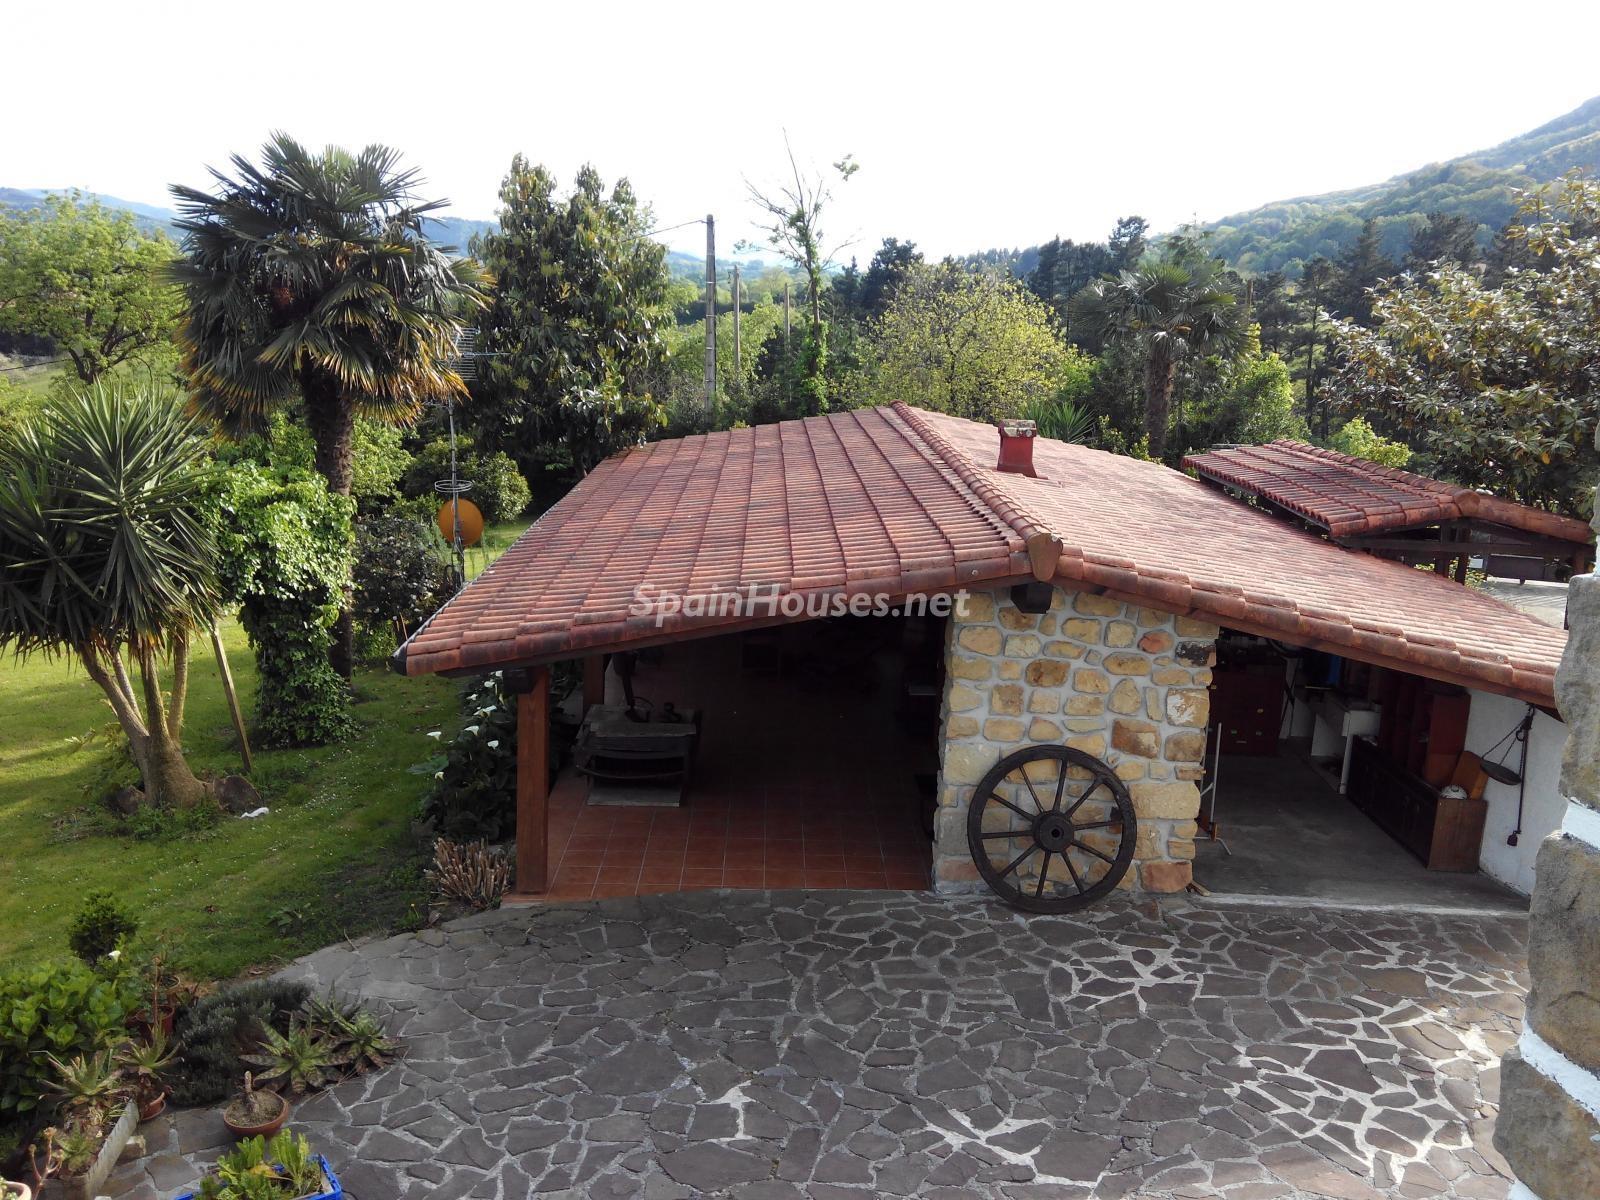 9. House for sale in Hondarribia Guipúzcoa - Charming Country House in Hondarribia, Guipúzcoa